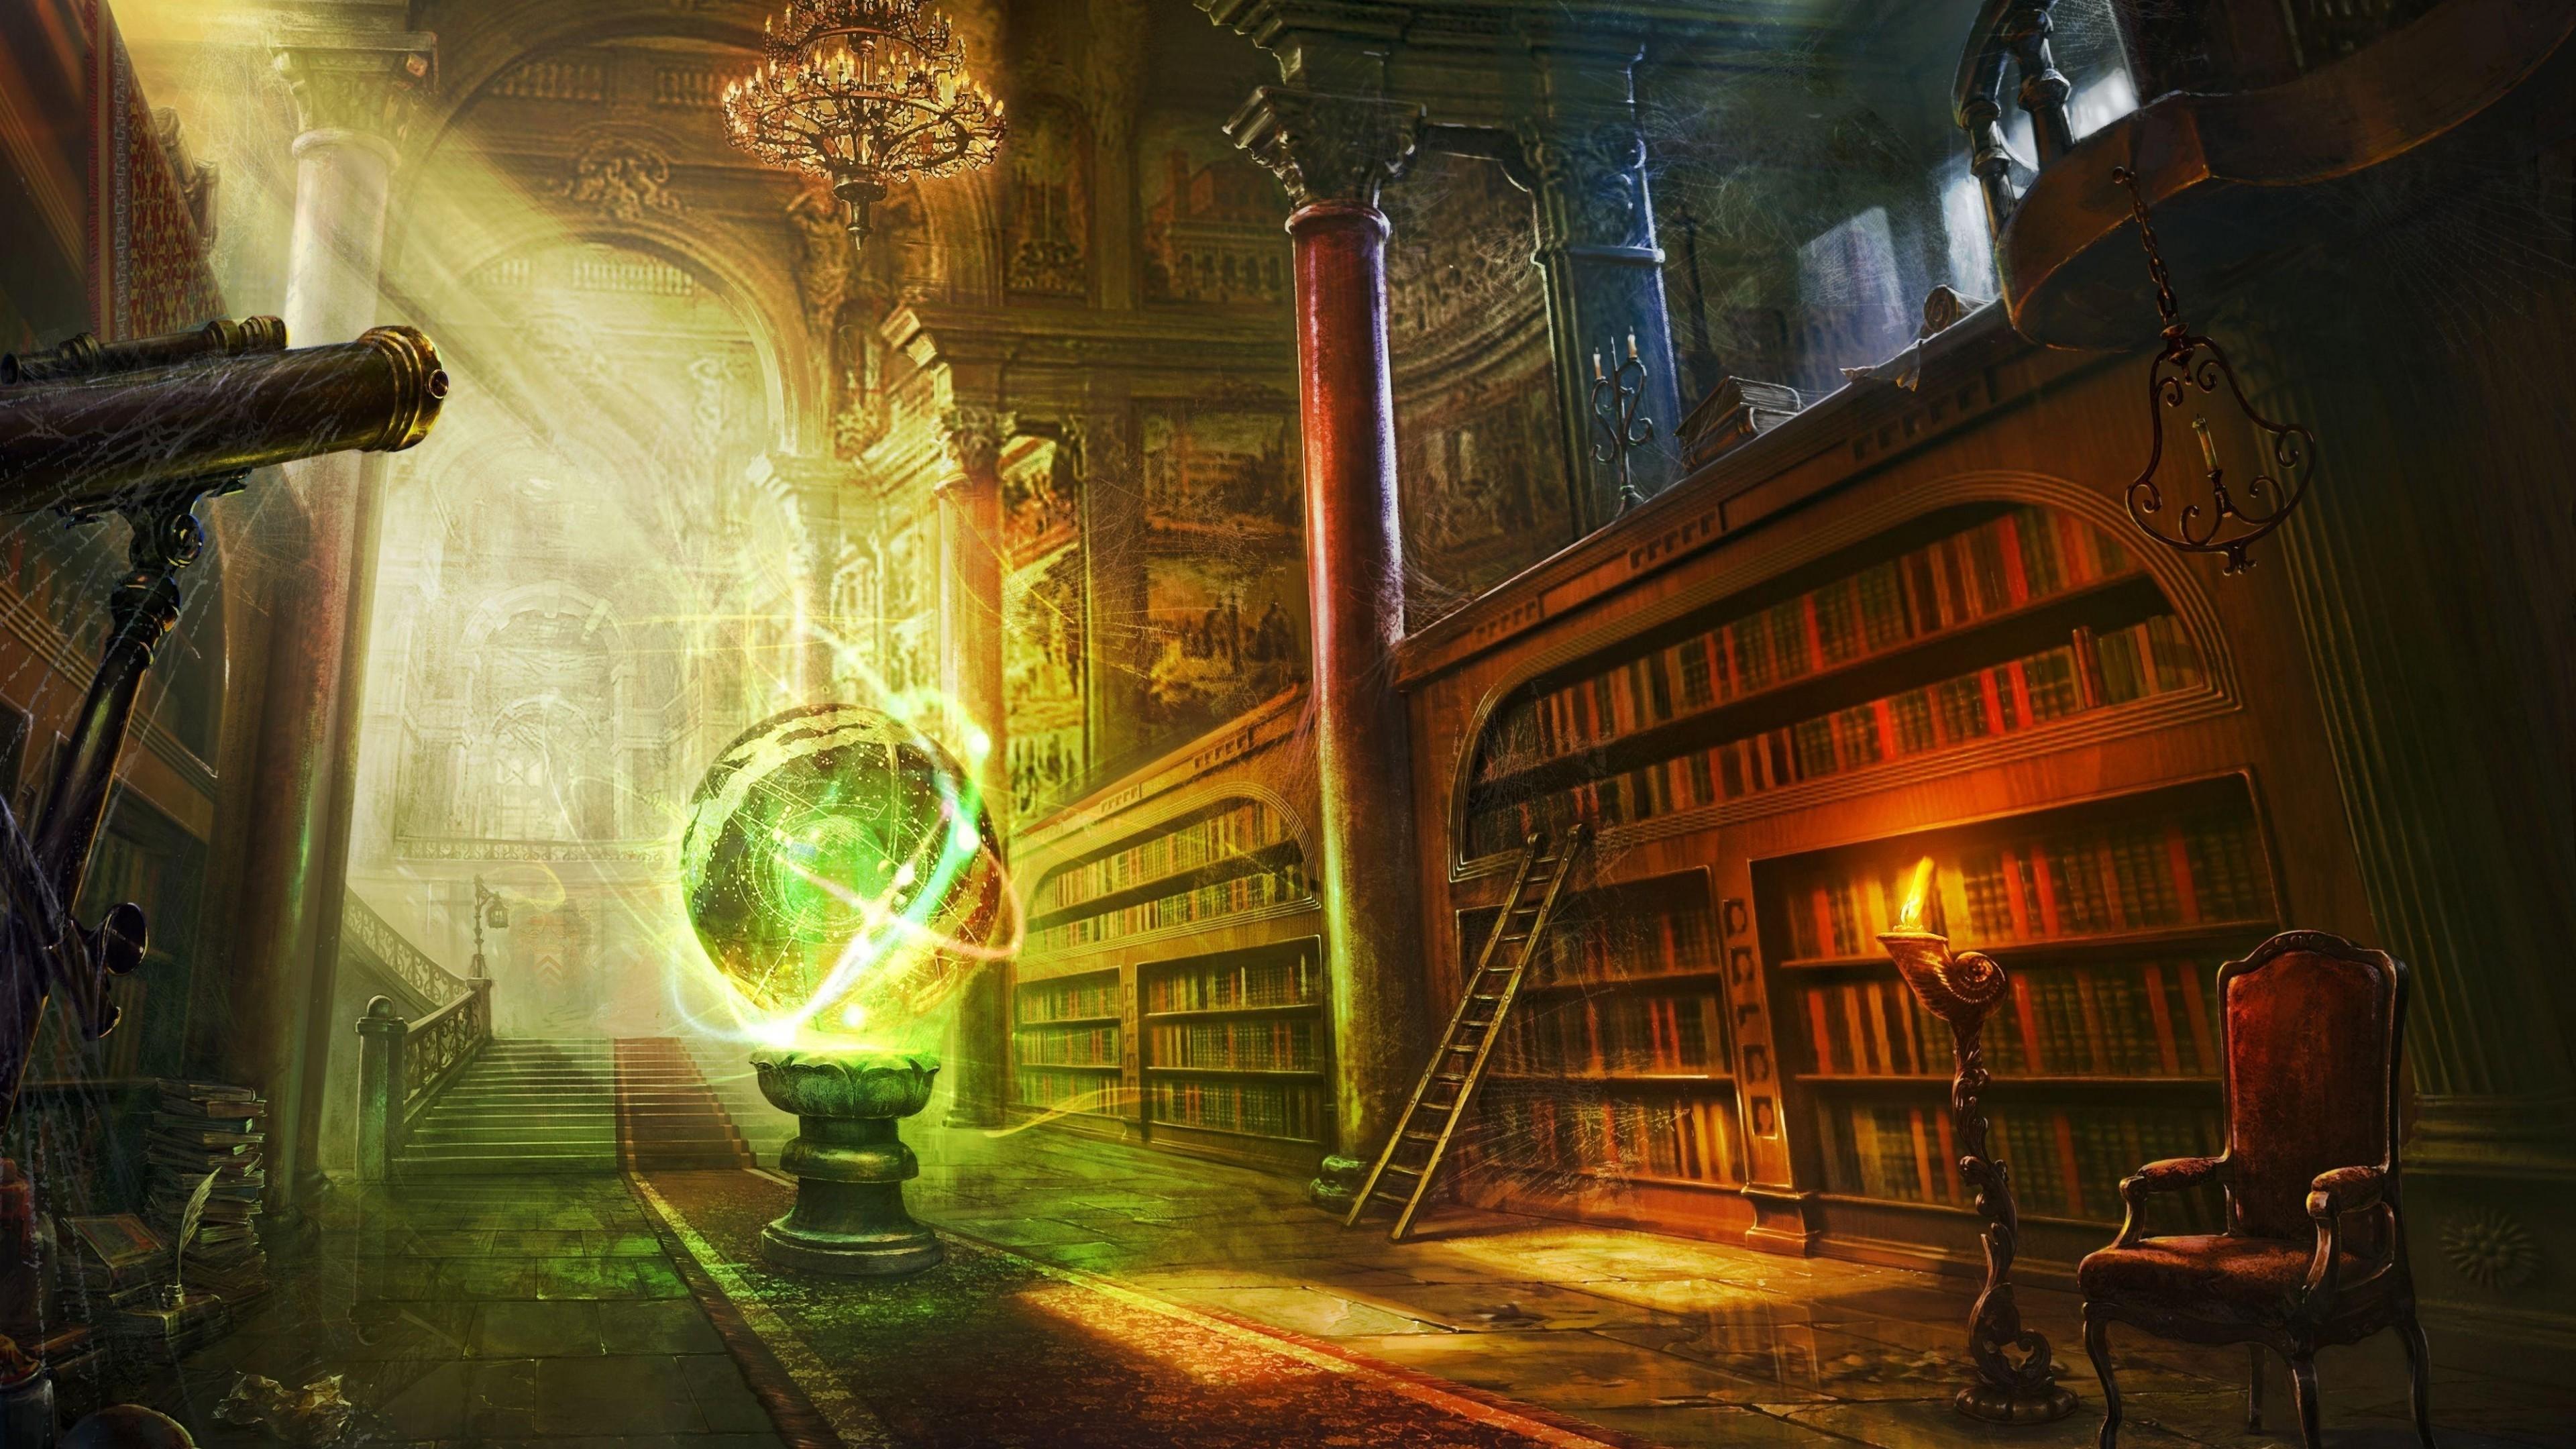 fantasy-room-magical-library-castle-sunlight